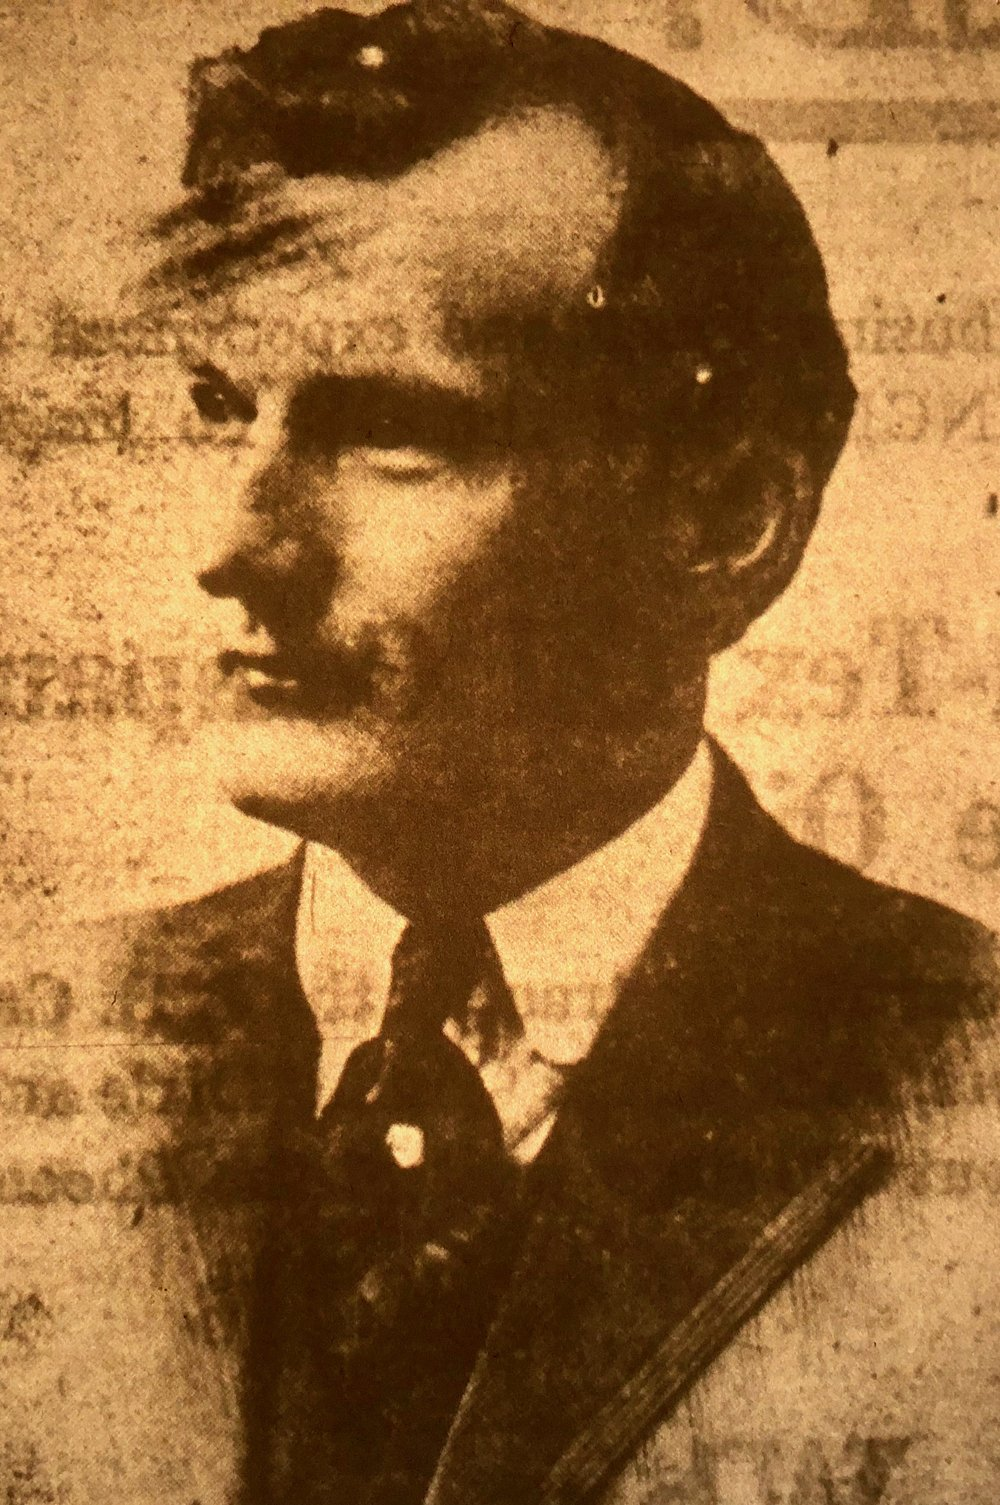 State Sen. Houston Emory of Garland and Montgomery counties opposed women's suffrage. (Arkansas Democrat-Gazette)